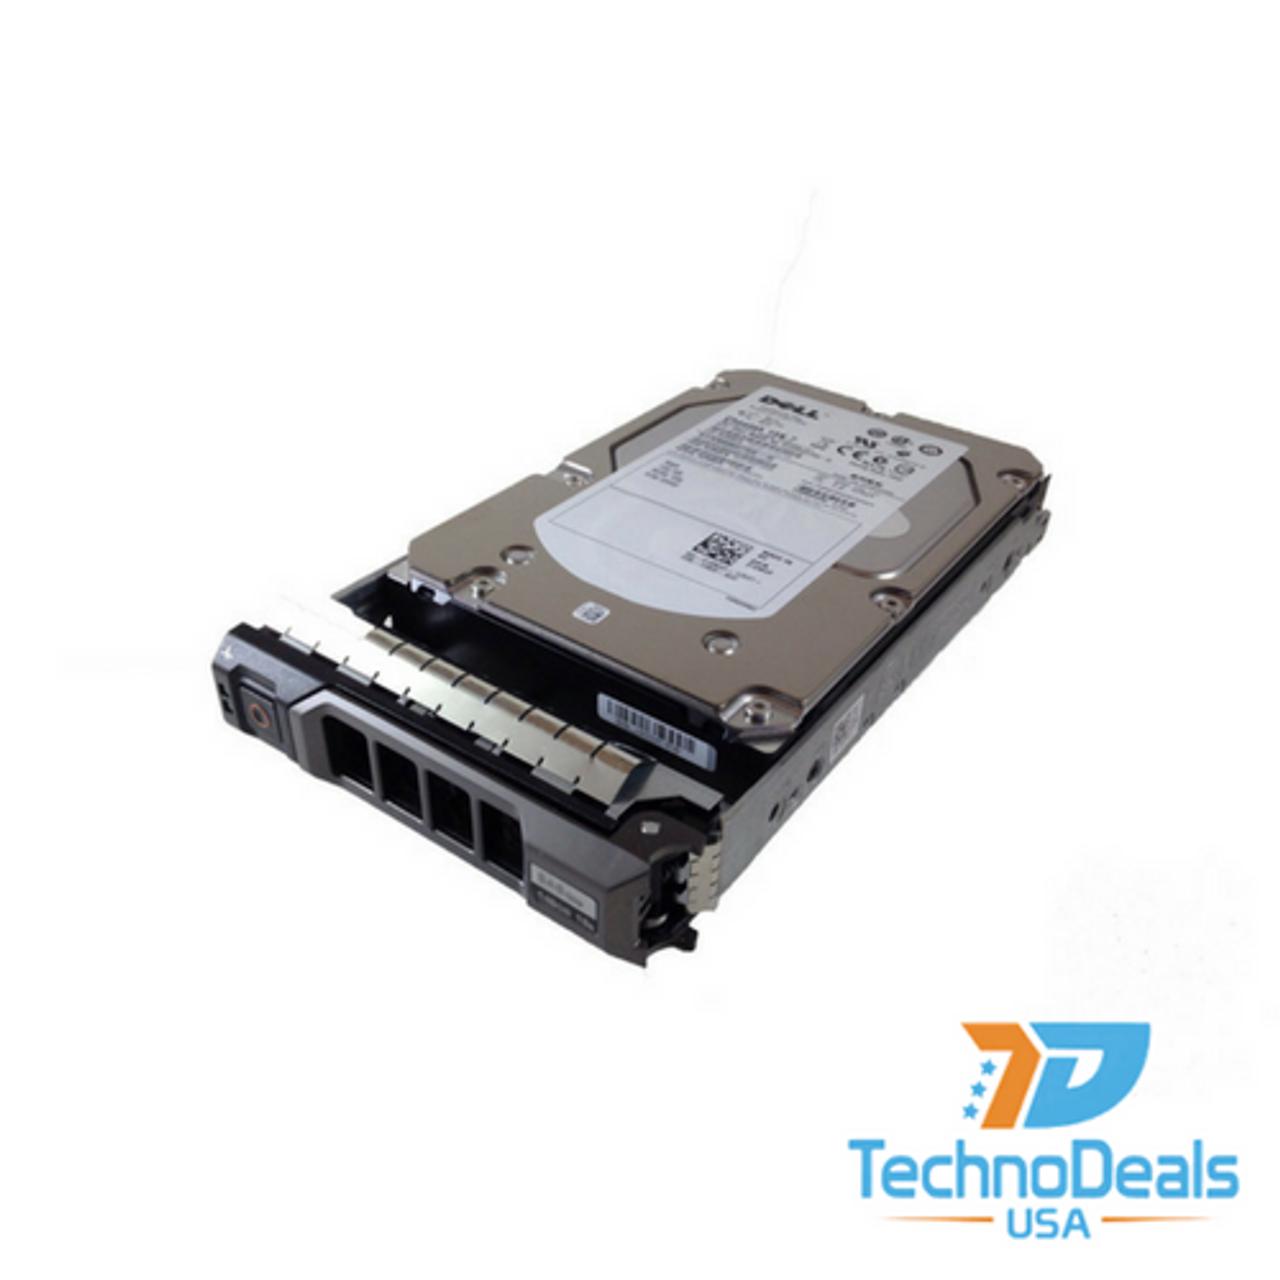 Seagate Cheetah ST3146855SS 146GB 15K RPM 16MB Cache SAS HDD Dell TN937